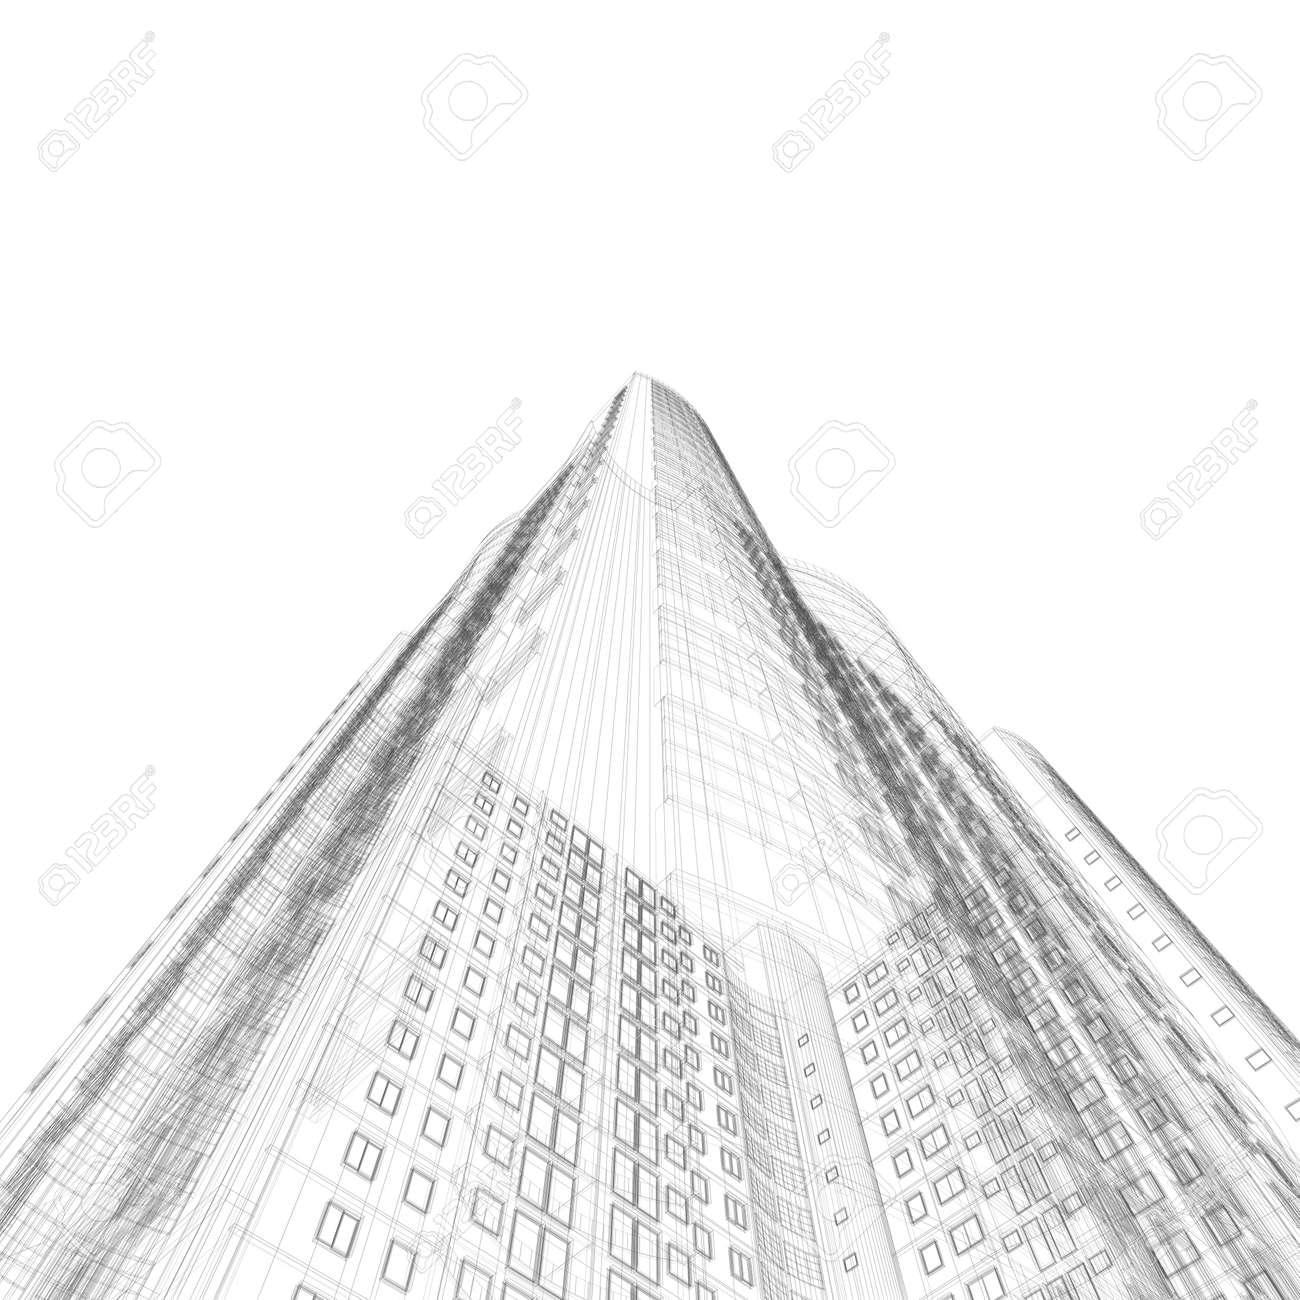 Architecture blueprint of construction skyscraper on white architecture blueprint of construction skyscraper on white background stock photo 5621778 malvernweather Images